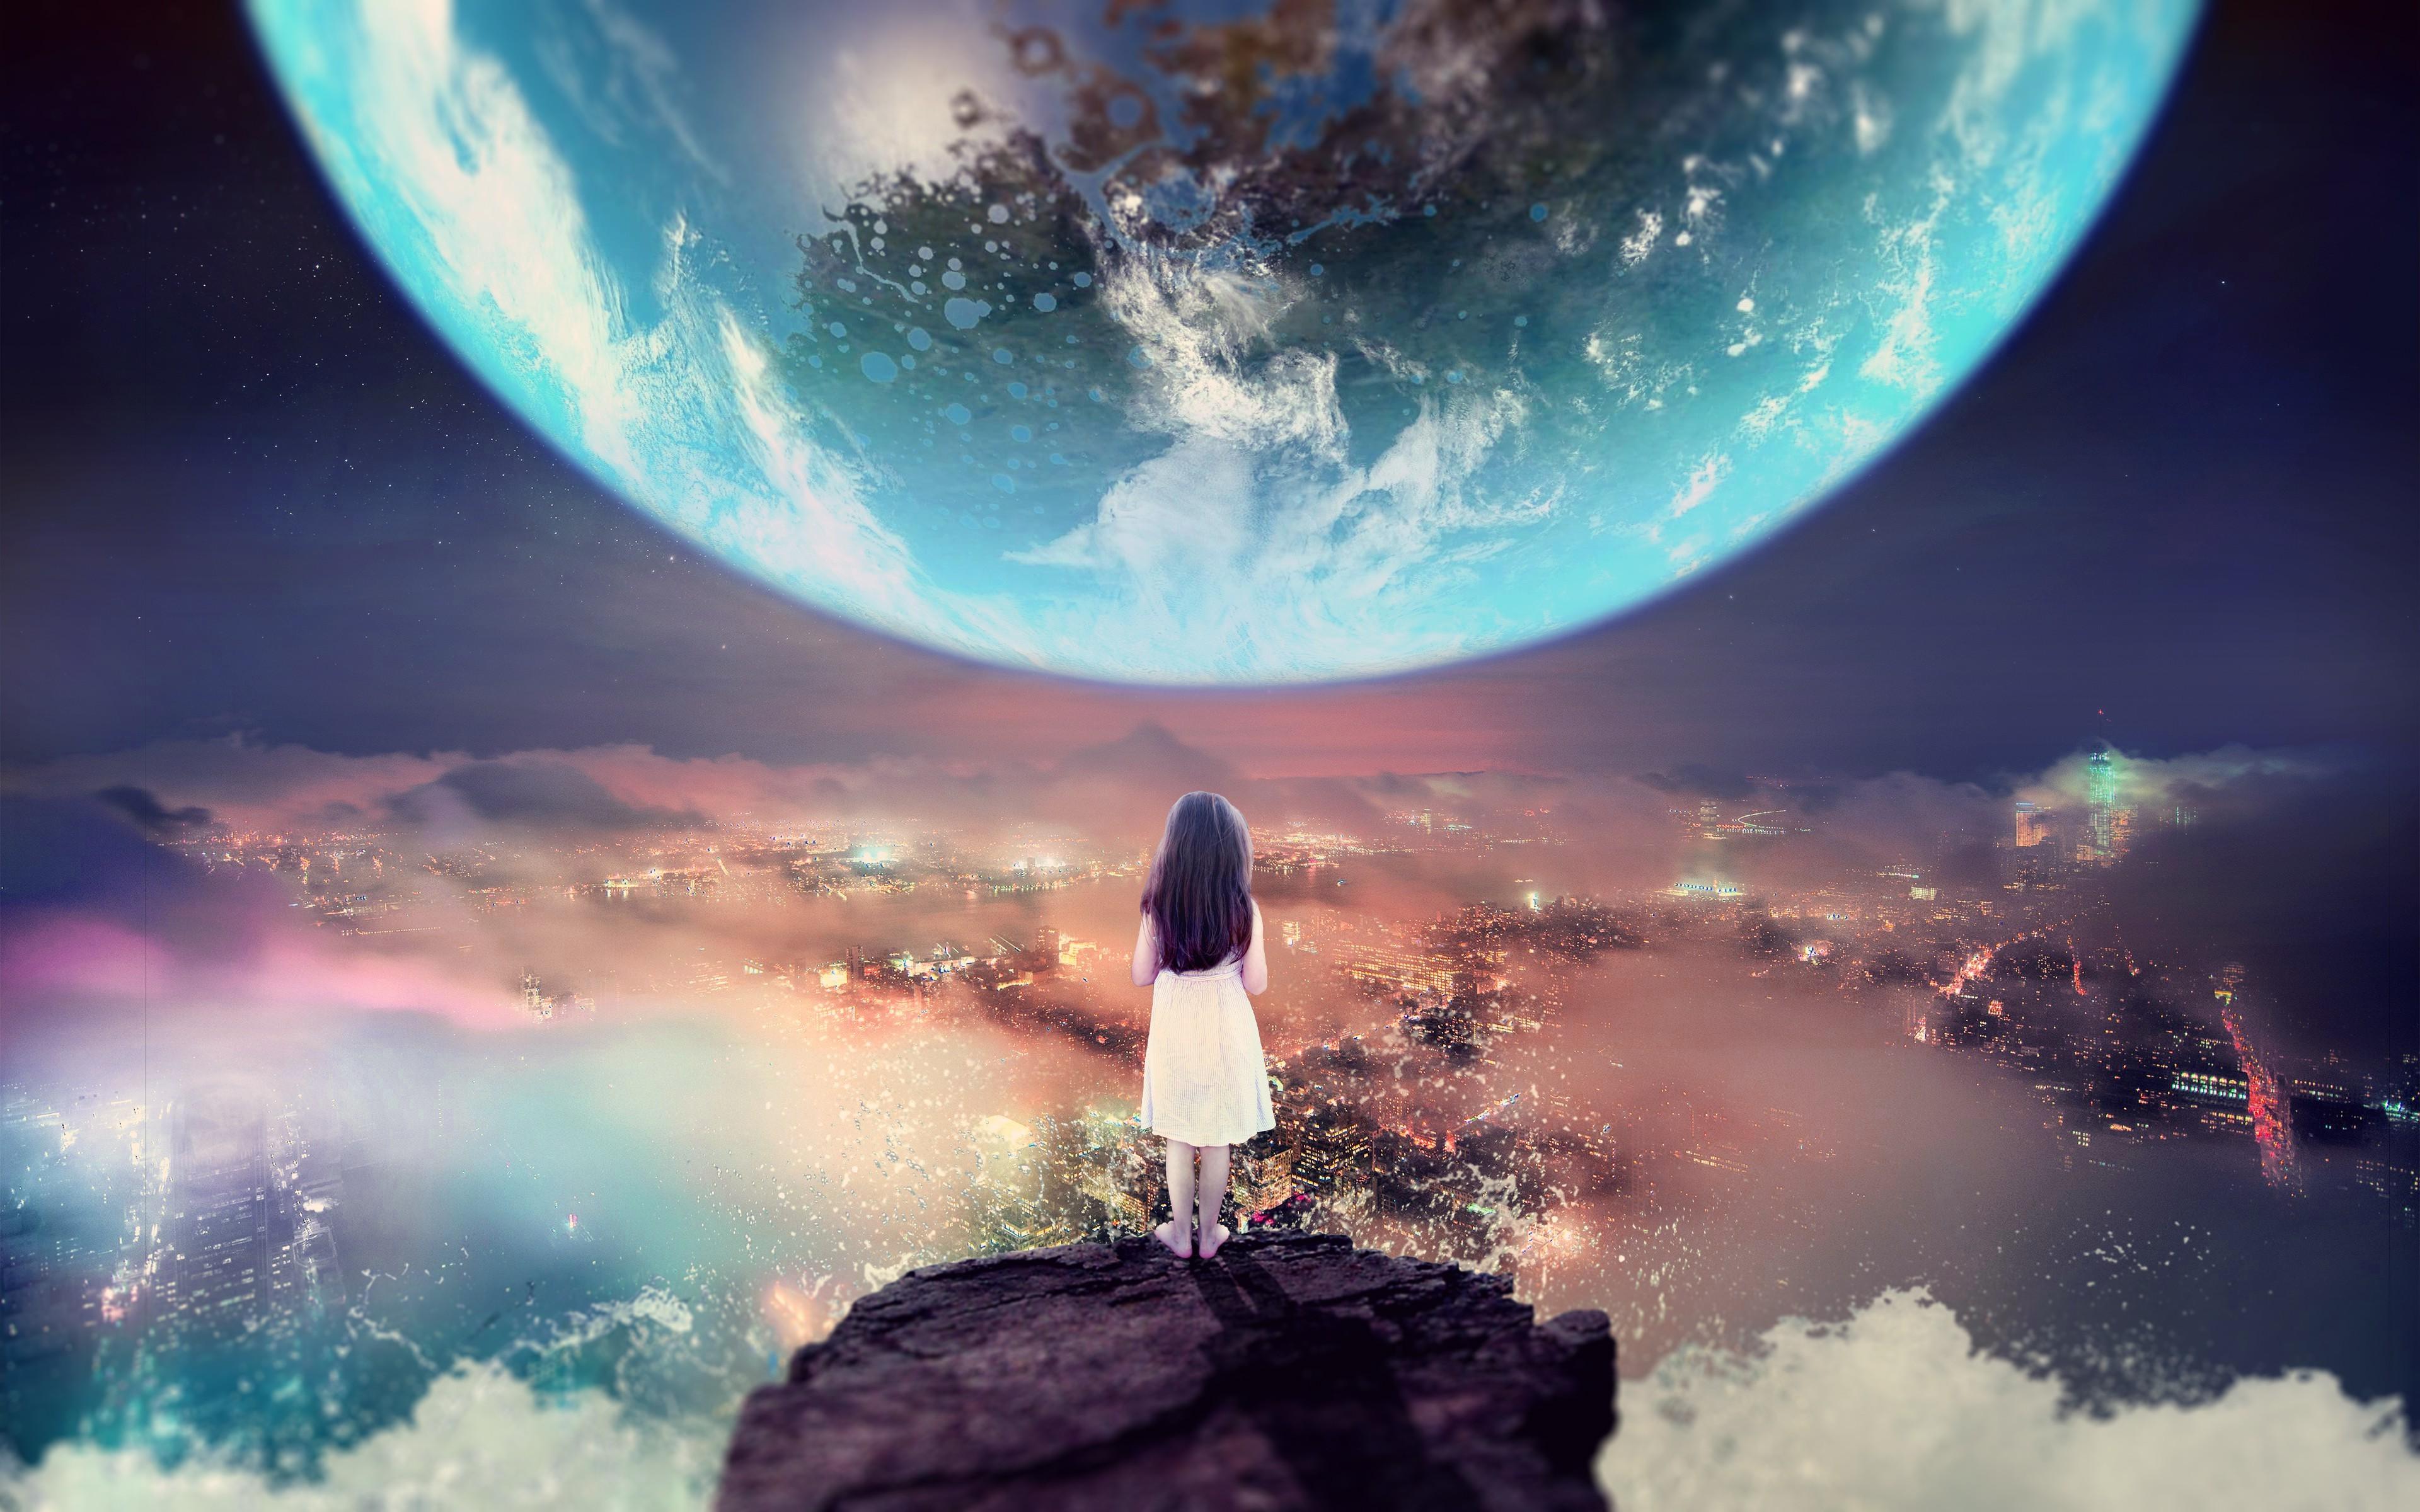 Earth Digital Art Hd Wallpaper: Wallpaper : Digital Art, Sea, City, Night, Children